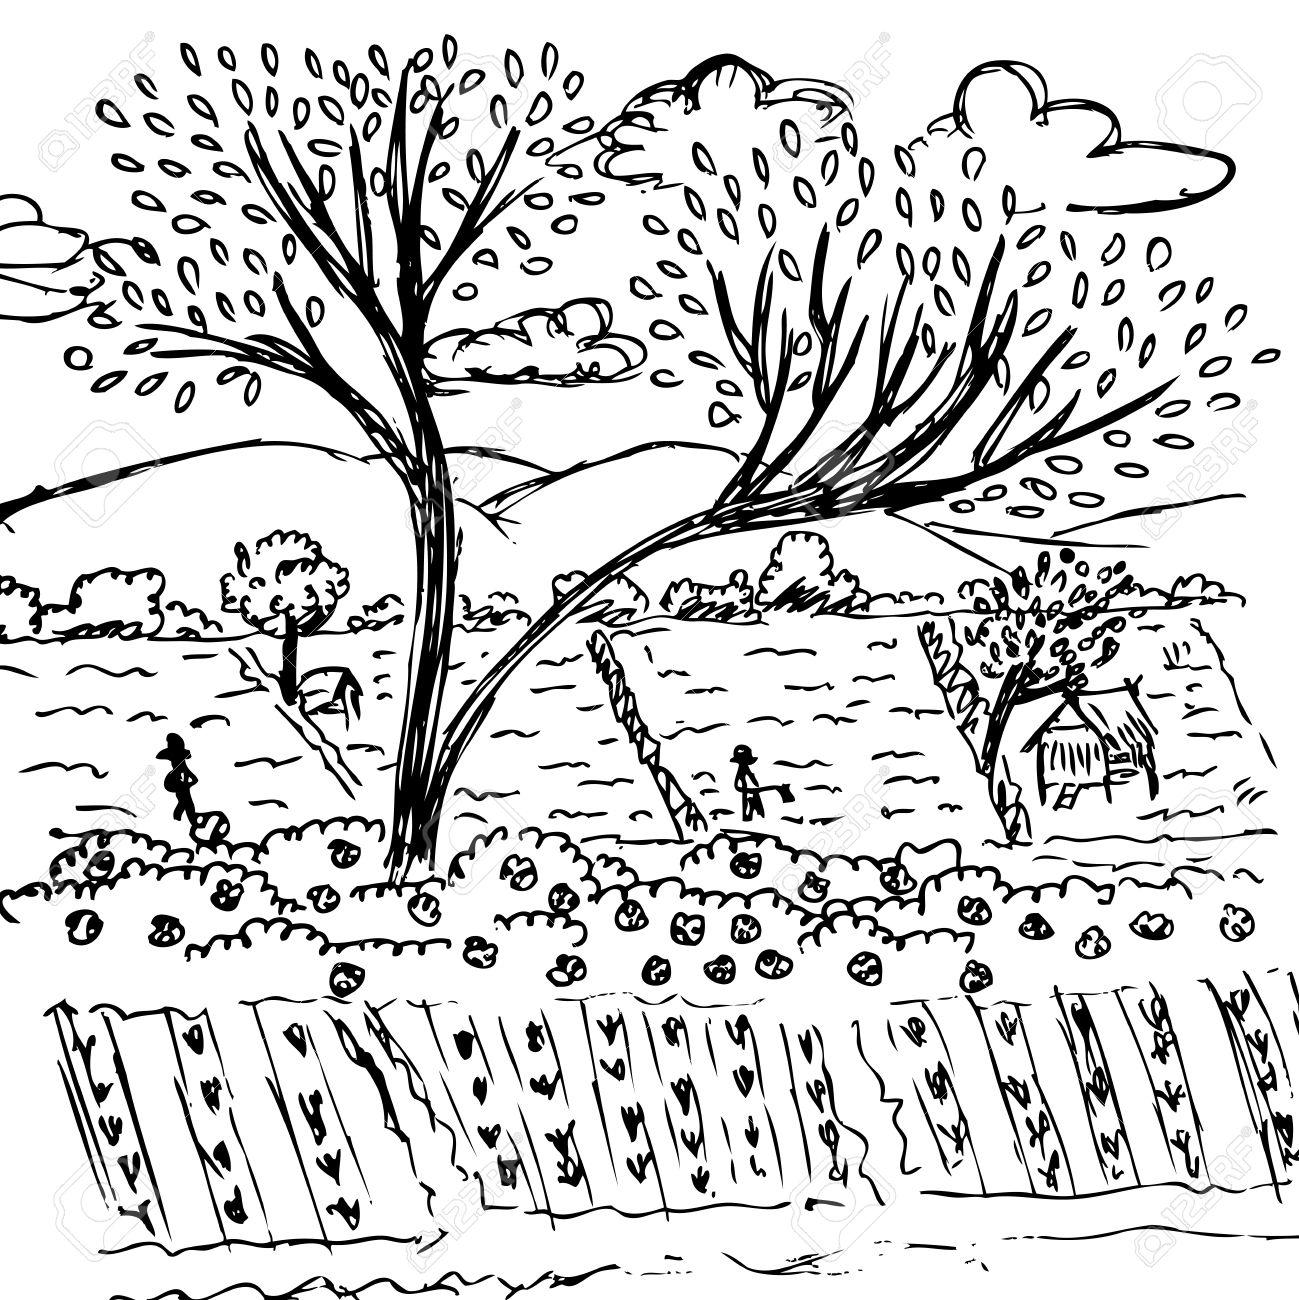 Farmland Sketch, Free Hand Drawing Nature Vector Royalty Free ... for Farmland Sketch  53kxo